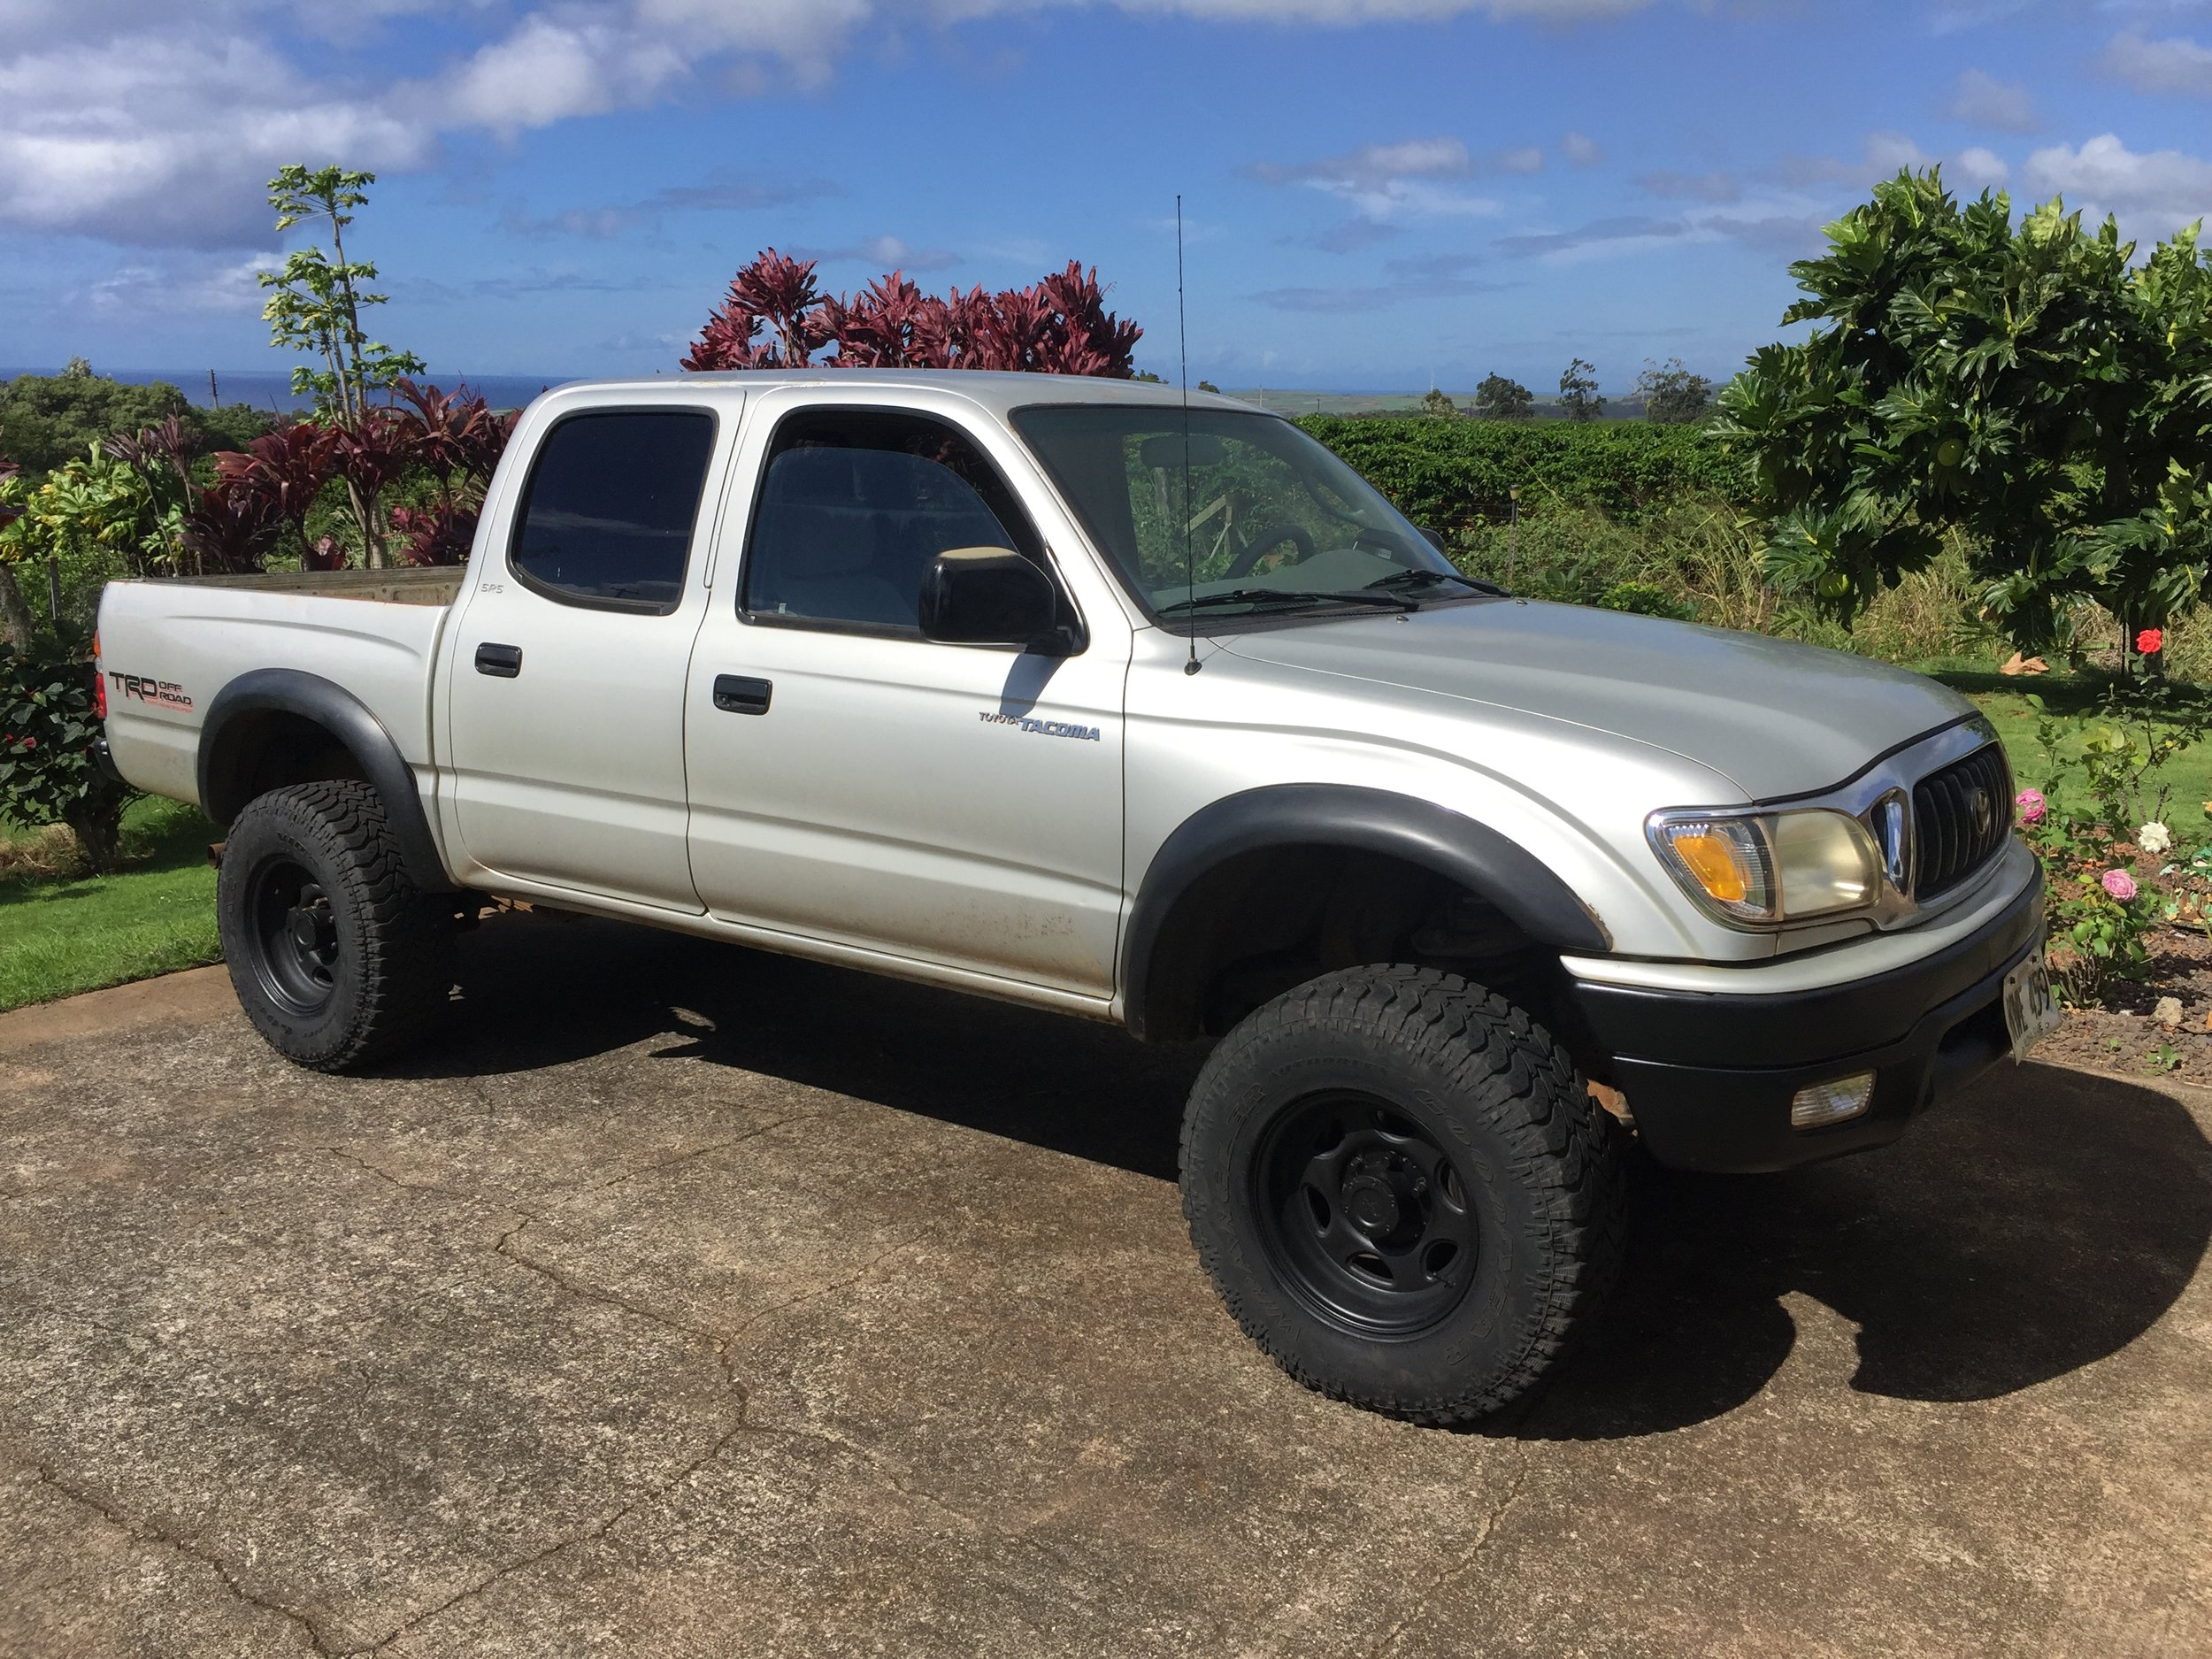 kauai overlander-toyota tacoma-camper-hawaii-4wd-roof top tent-tepui 3